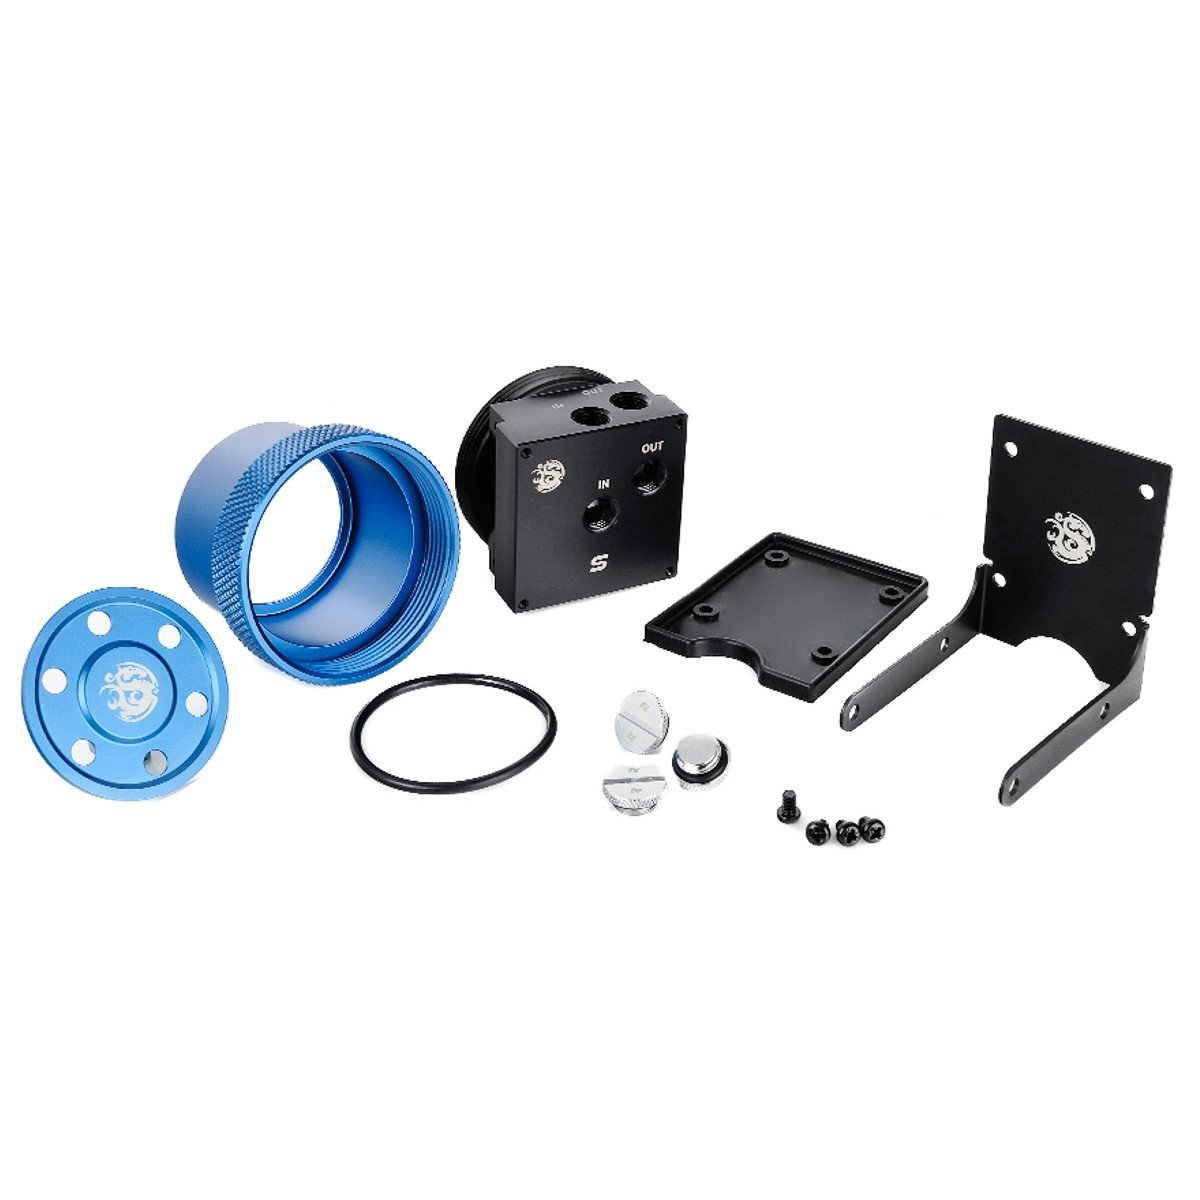 Bits Power D5 MOD Package (Clear Acrylic top + MOD kit V2 red) V2 Blue (BP-D5TMPSV2-BKBL)